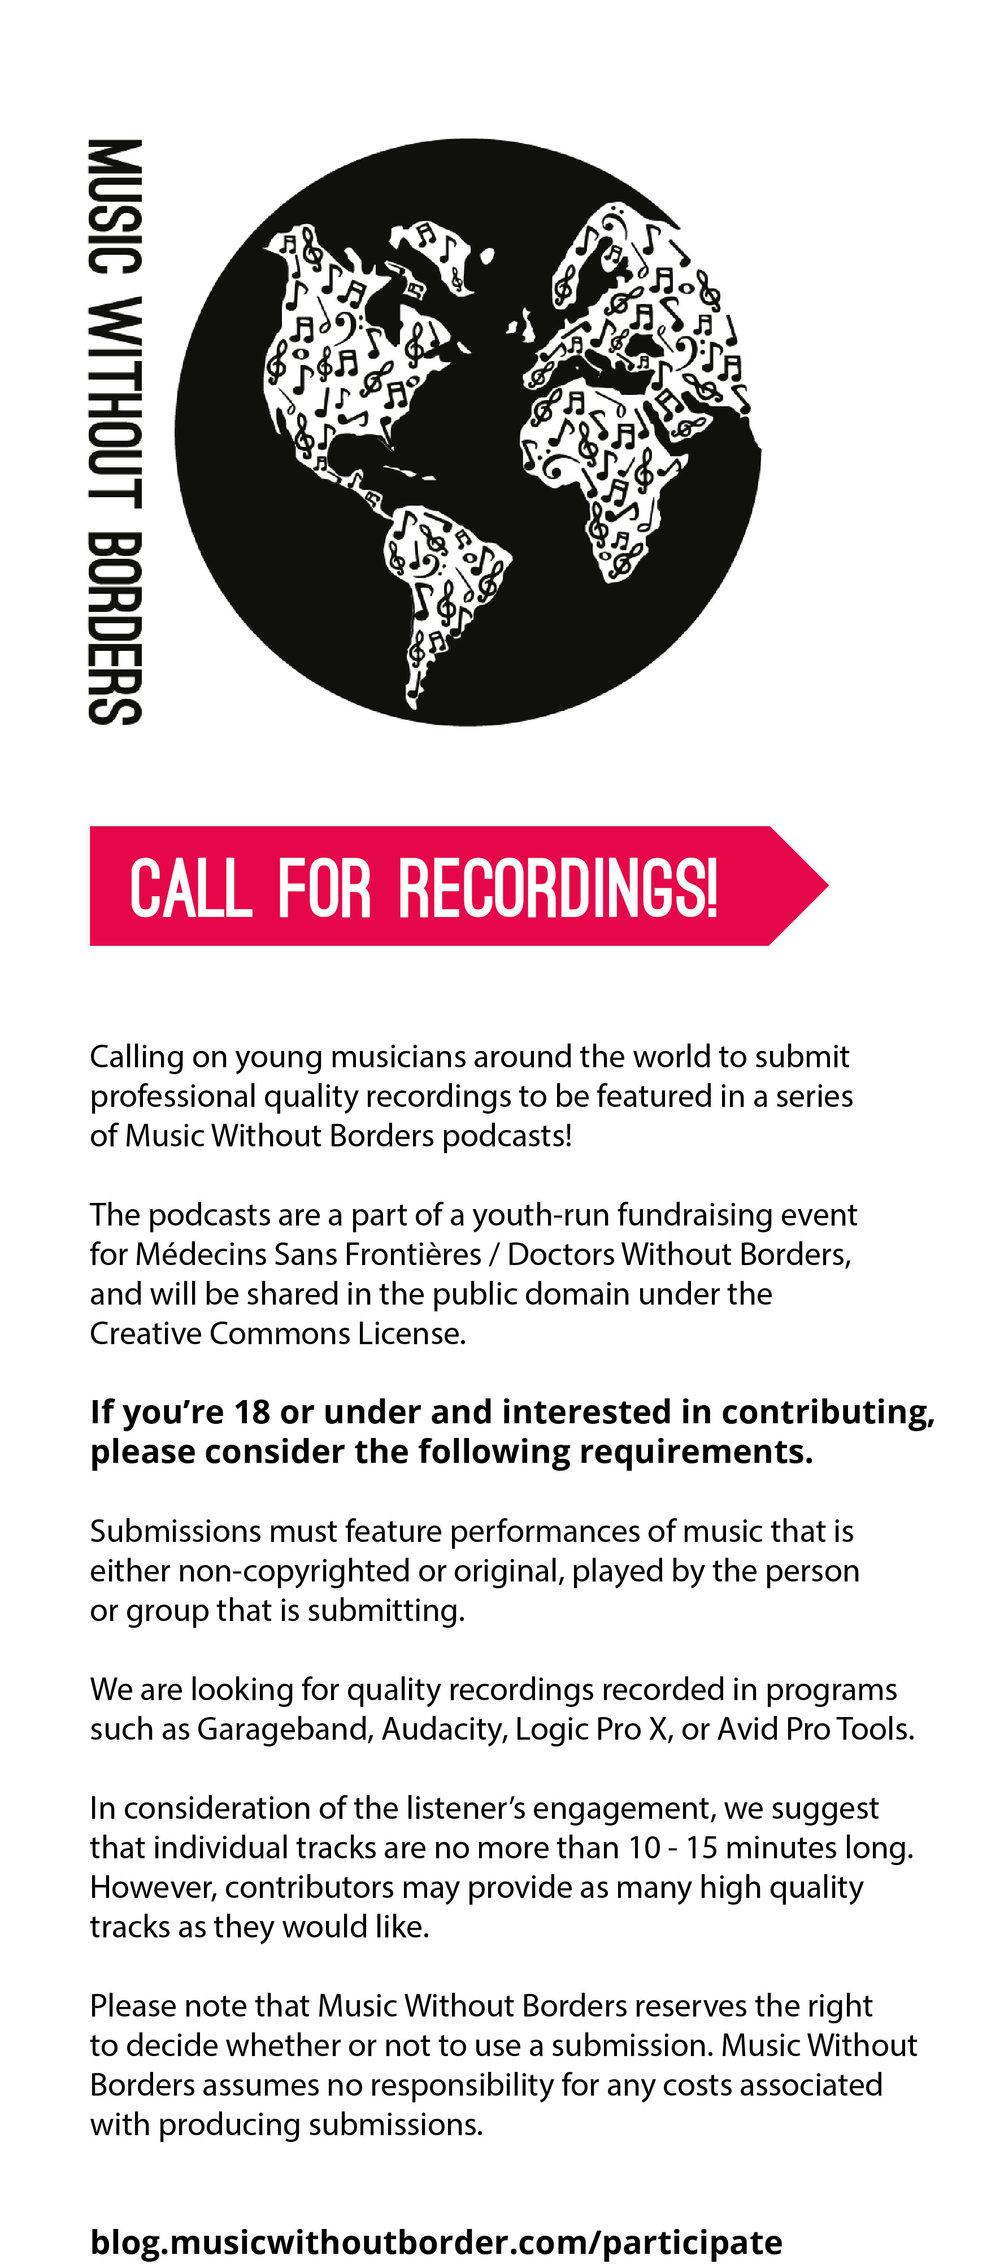 Call for Recordings.jpg